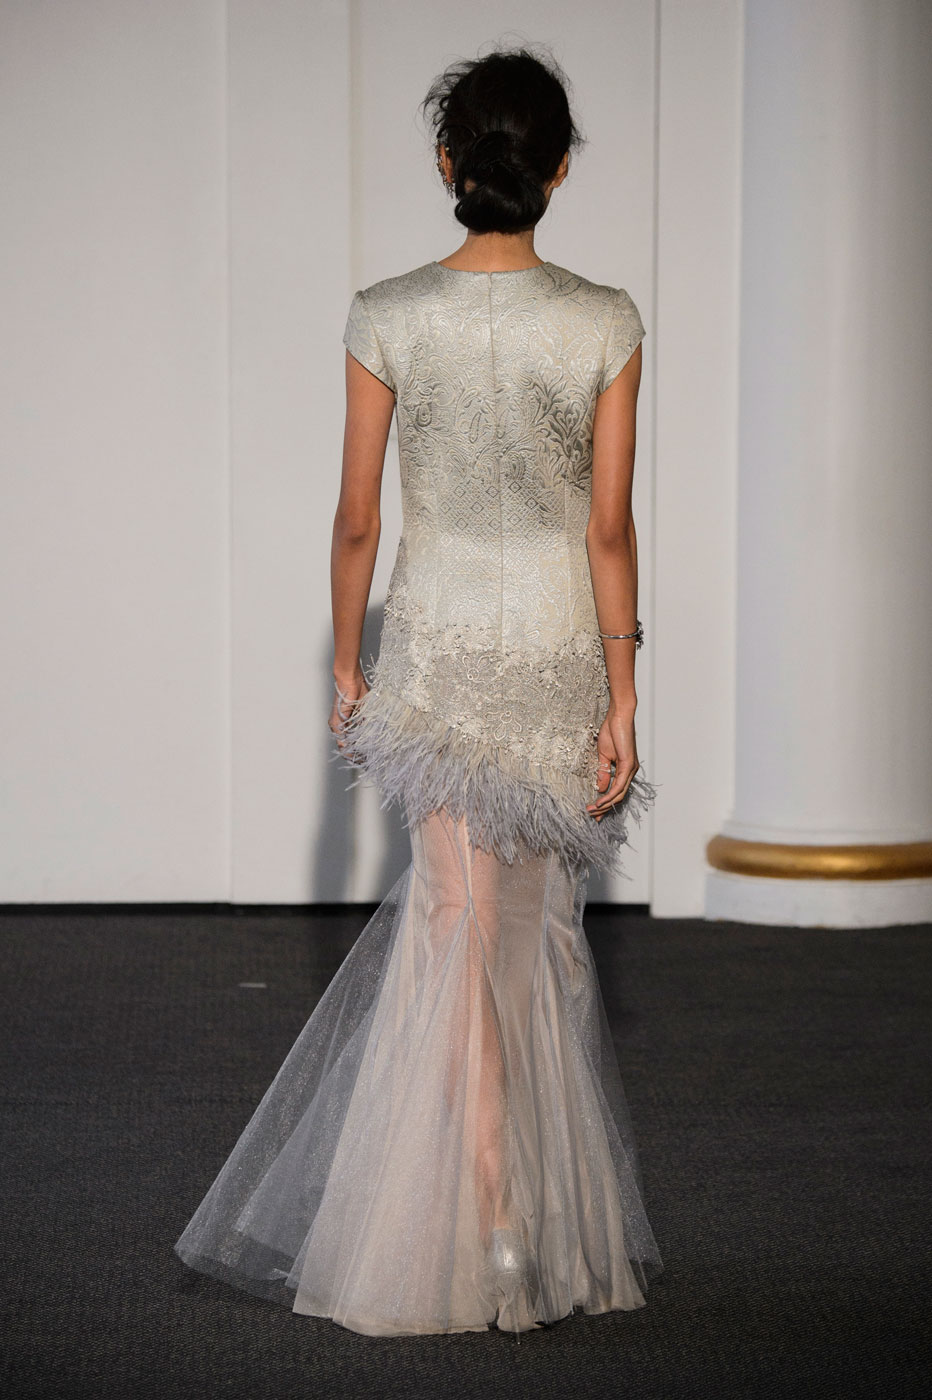 Busardi-fashion-runway-show-haute-couture-paris-spring-2015-the-impression-60